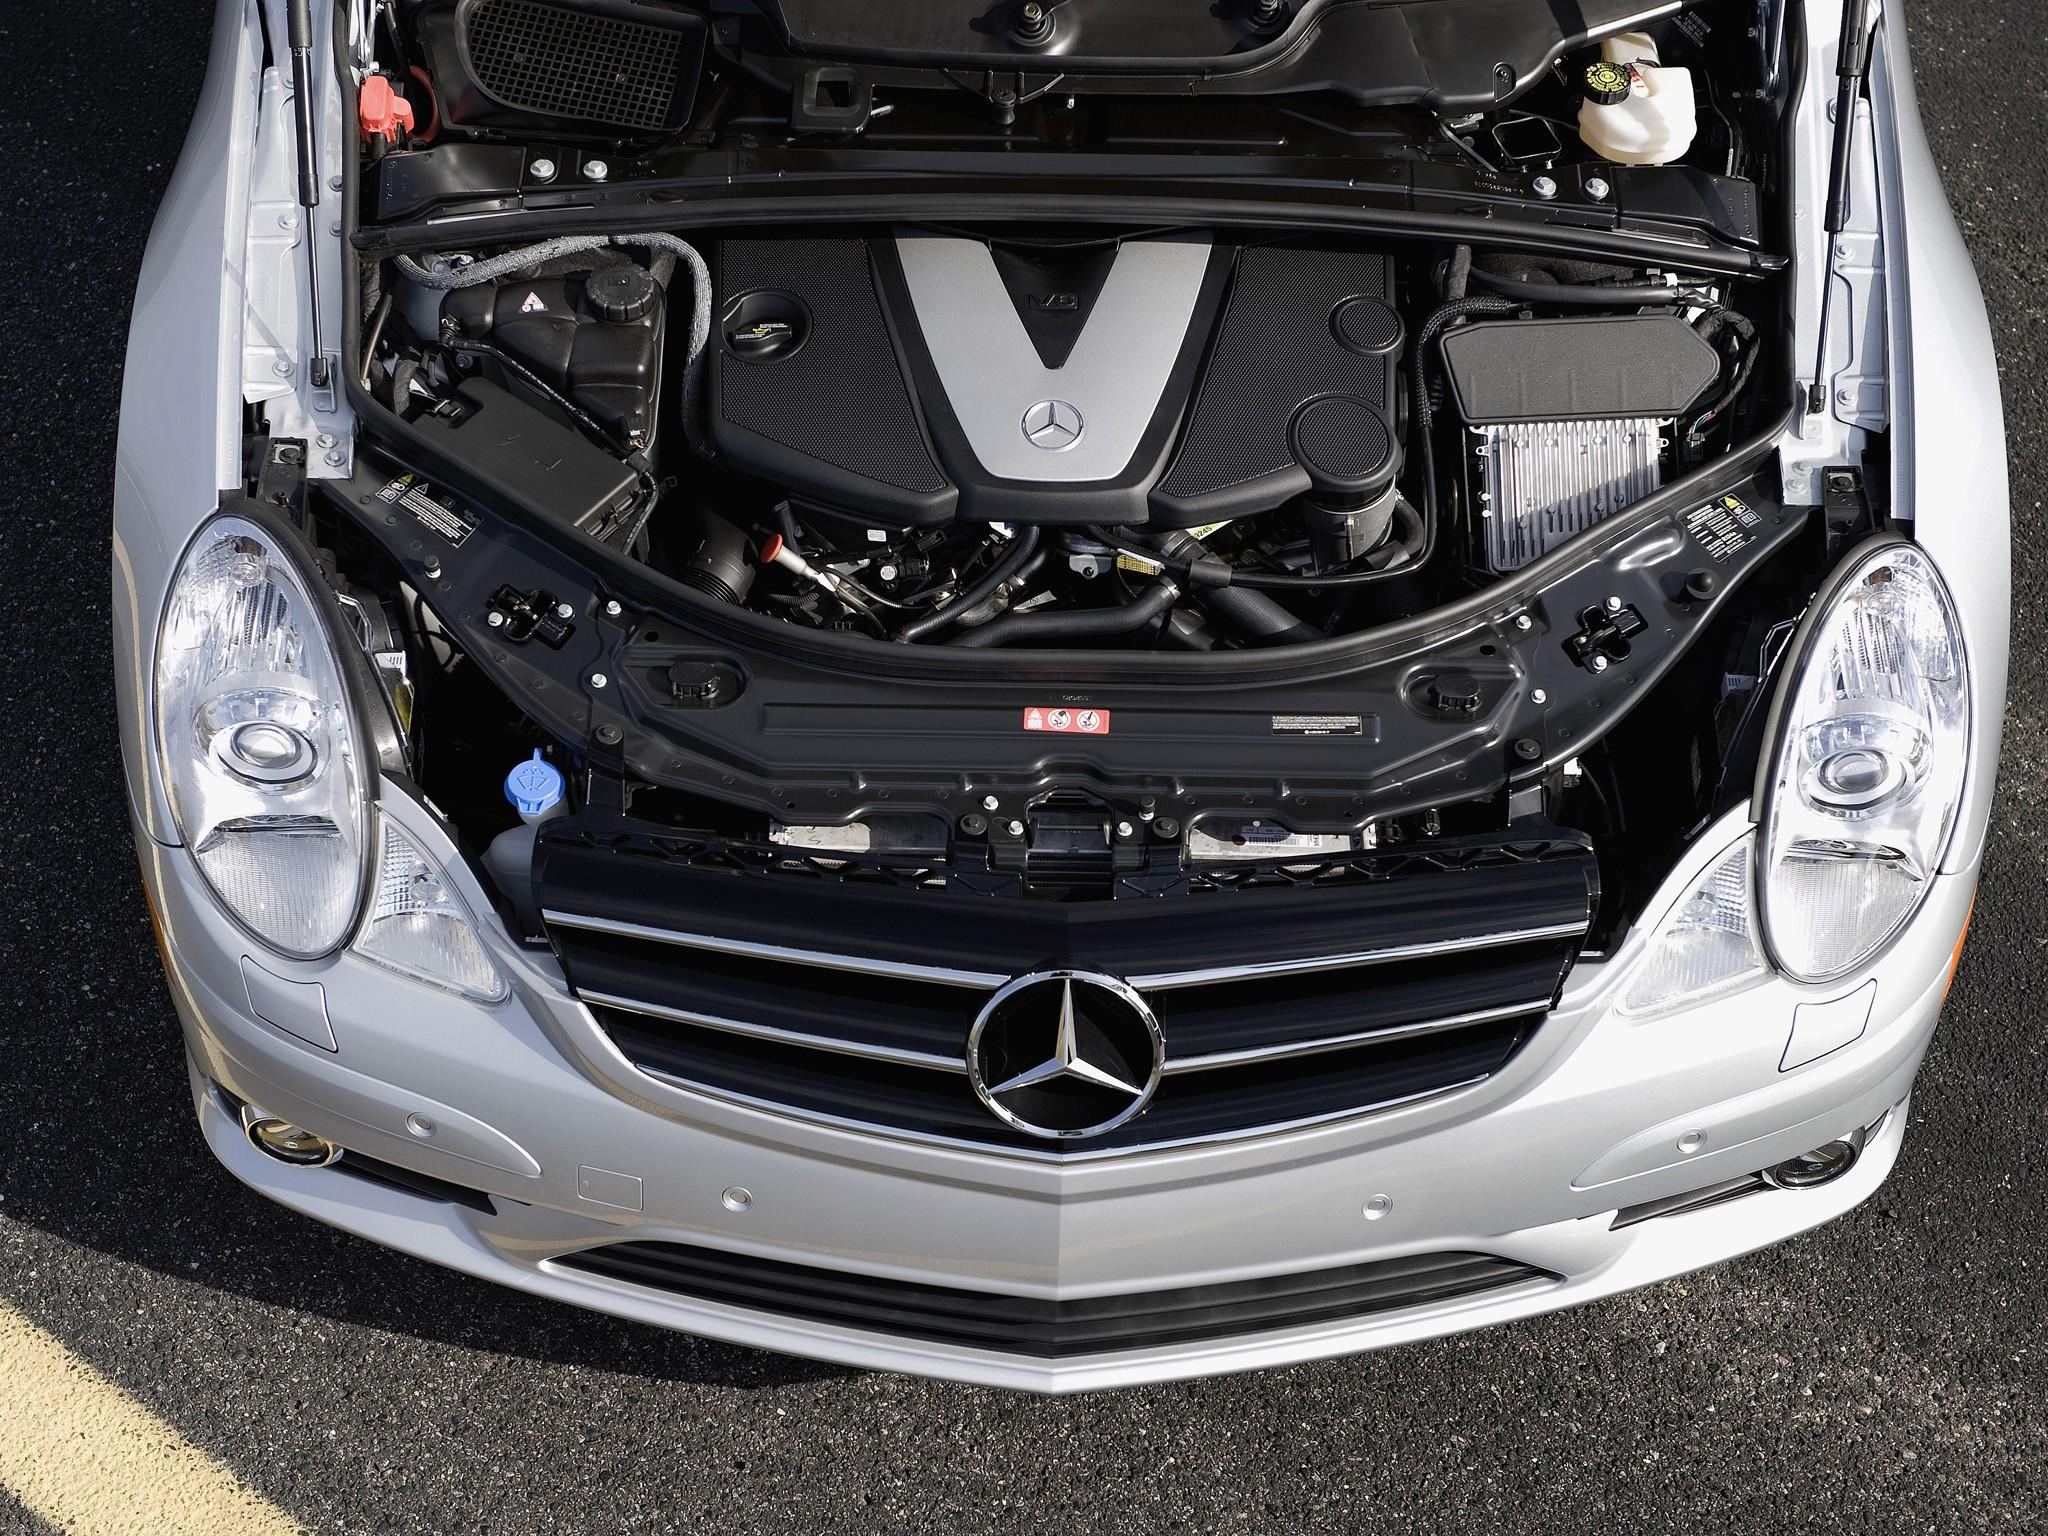 Mercedes benz r klasse w251 specs 2010 2011 2012 for Mercedes benz r